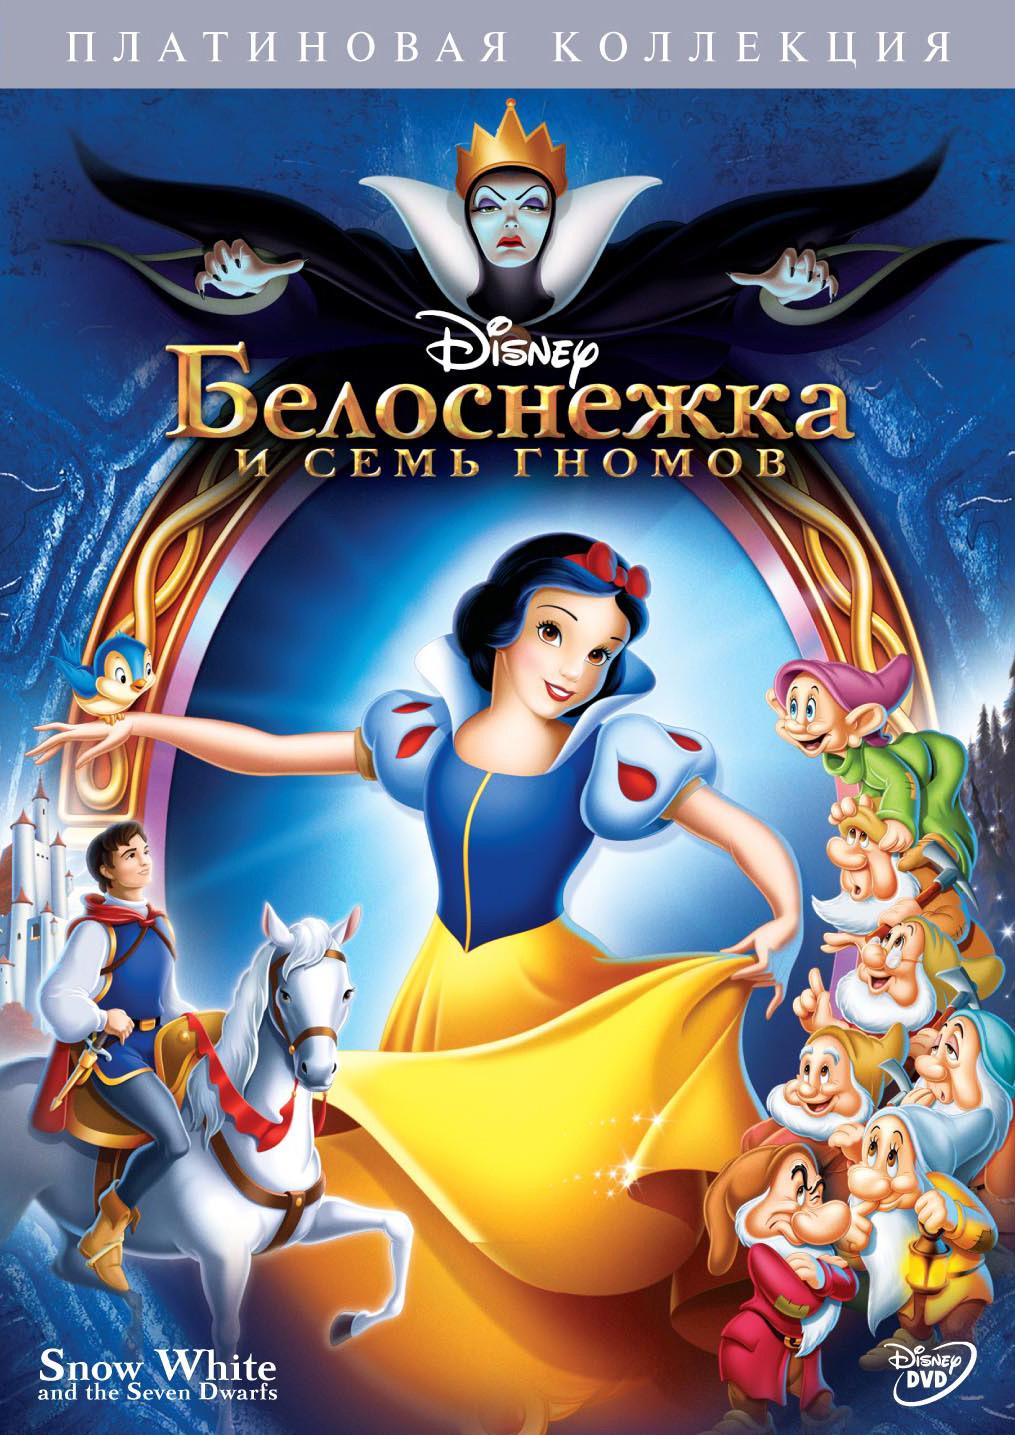 Snow White and the Seven Dwarfs Дополнительные материалы 1937